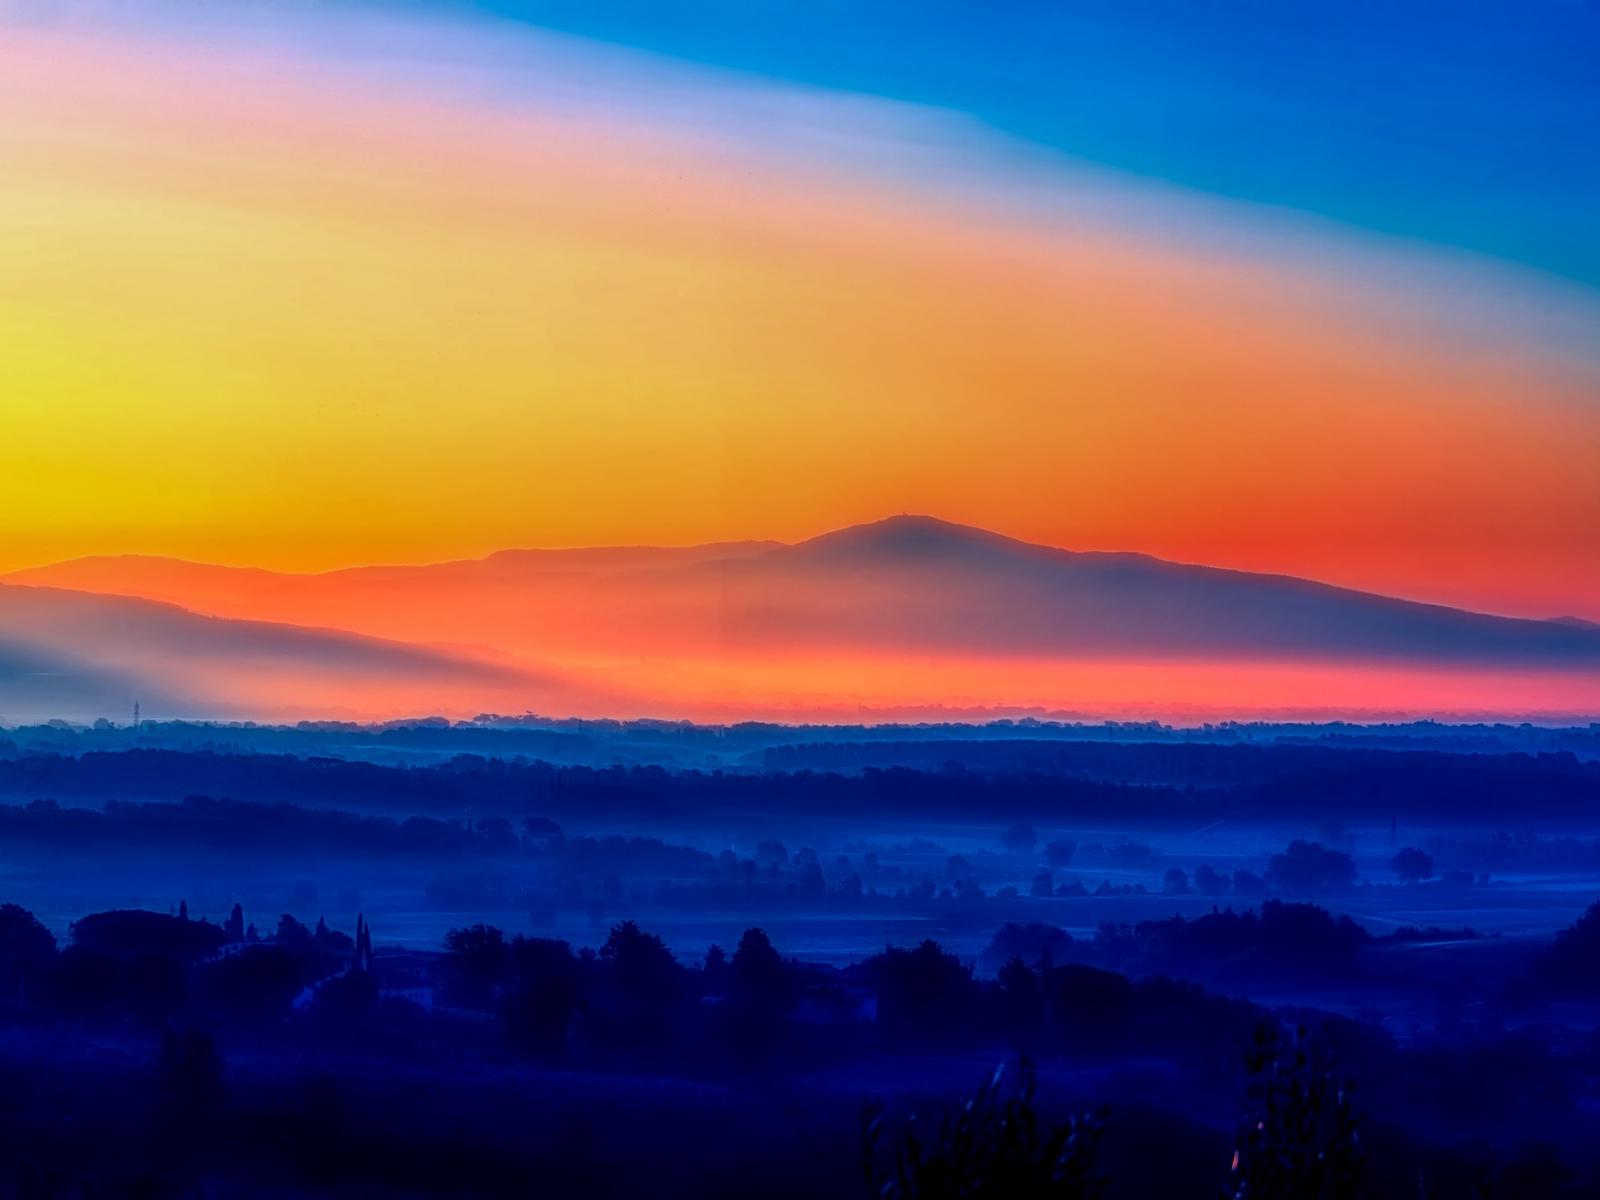 1600x1200 wallpaper Italy sunrise, morning, horizon